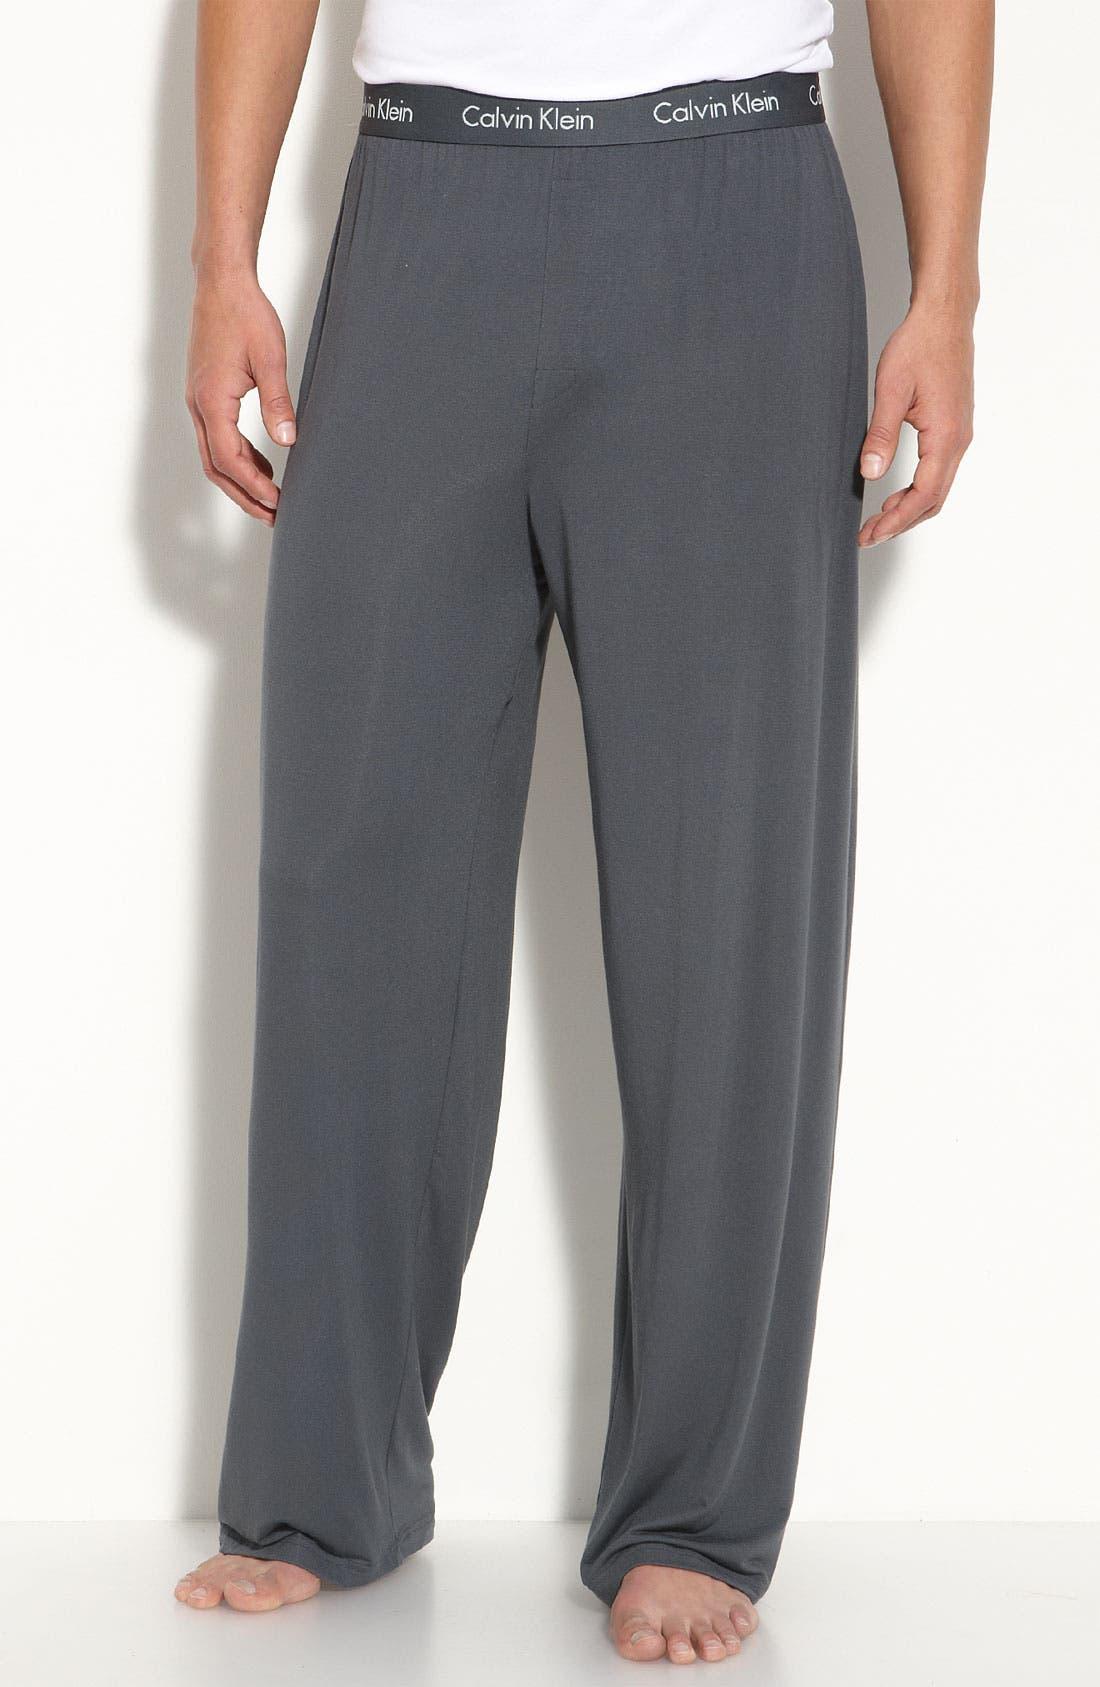 Alternate Image 1 Selected - Calvin Klein 'U1143' Micromodal Lounge Pants